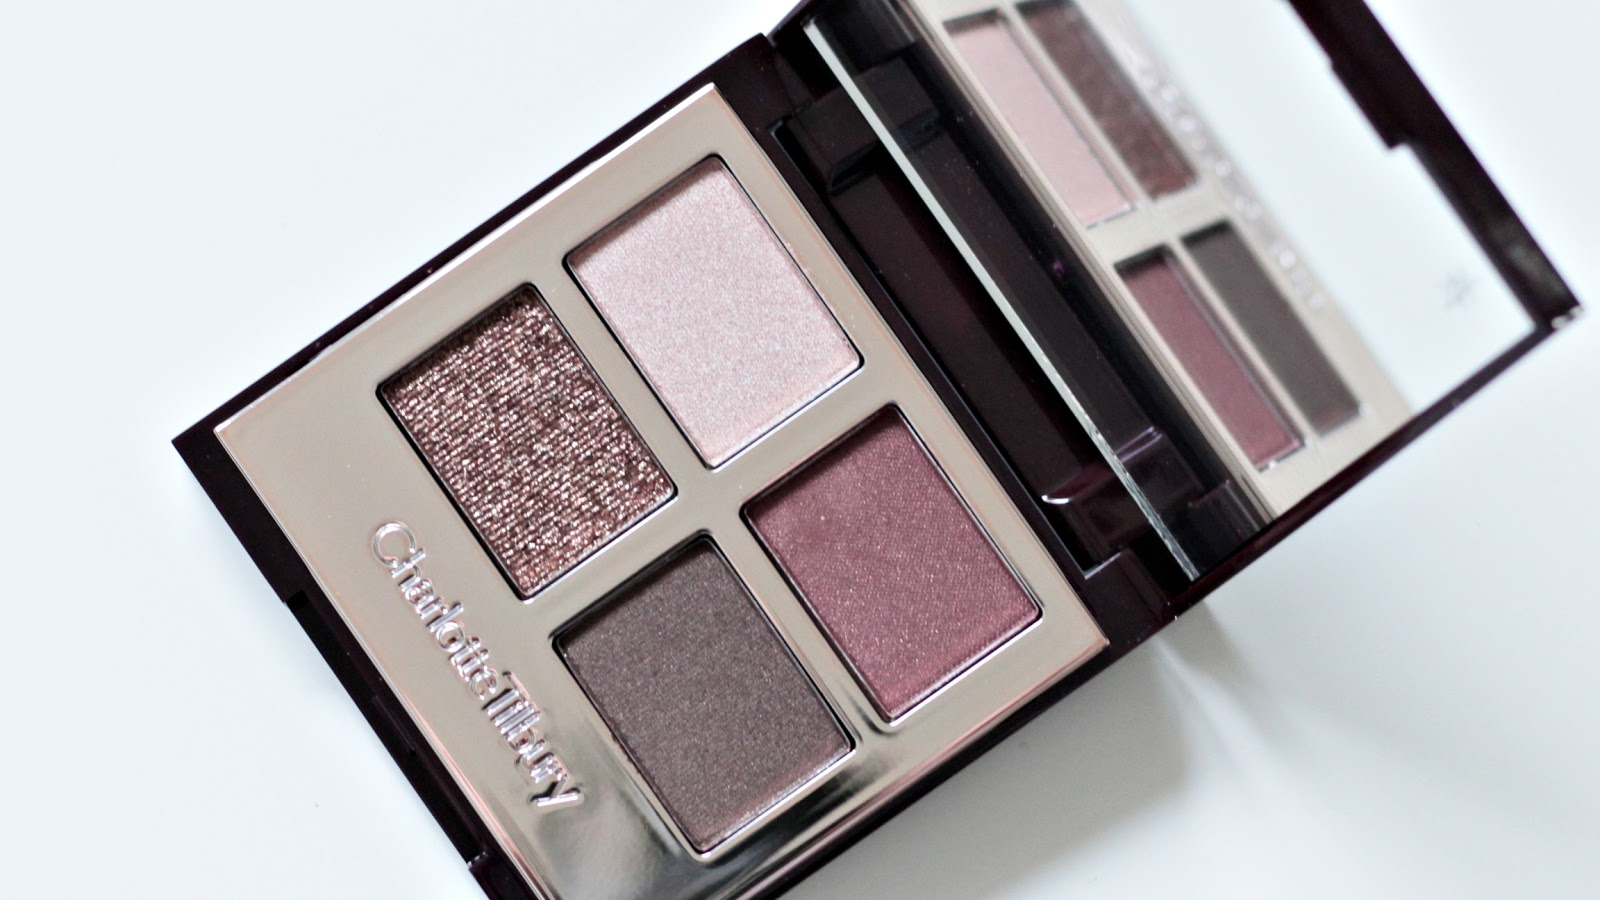 Charlotte Tilbury Dolce Vita Eyeshadow Palette